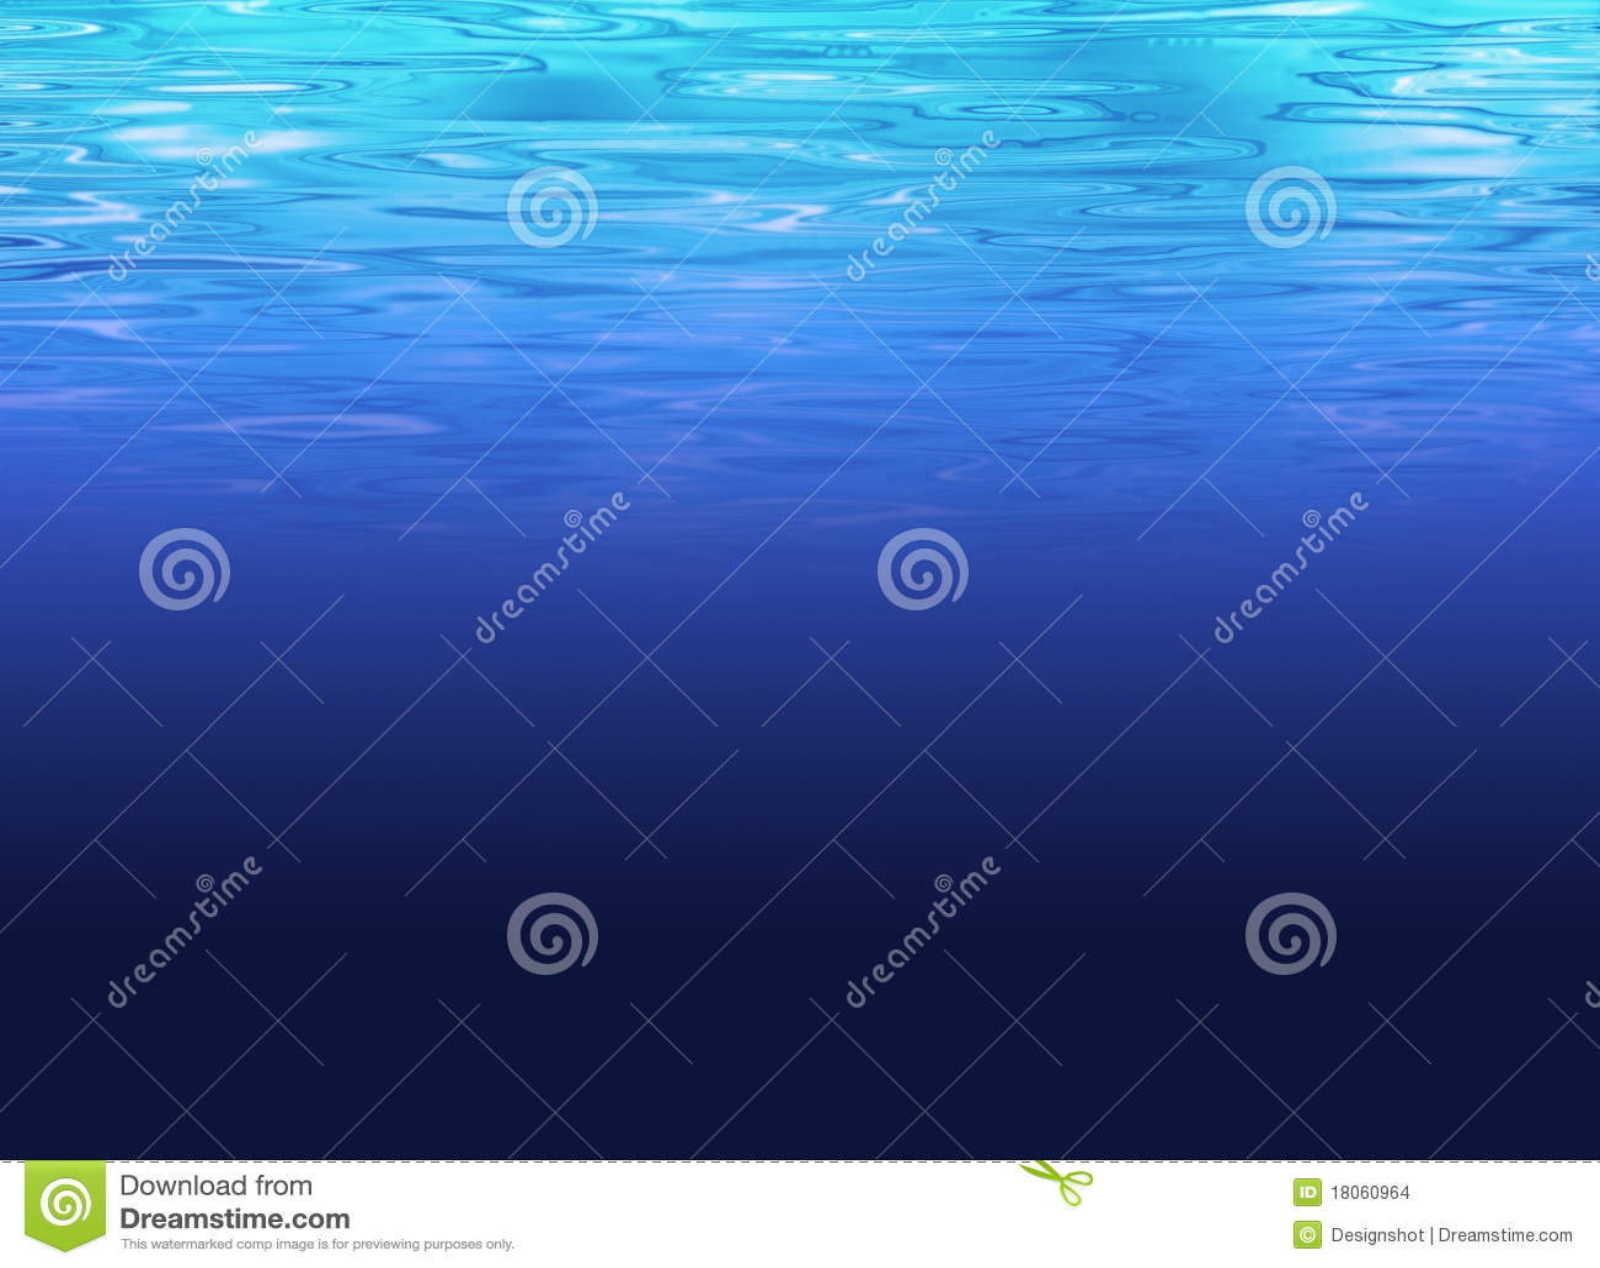 dream sea water background - photo #11